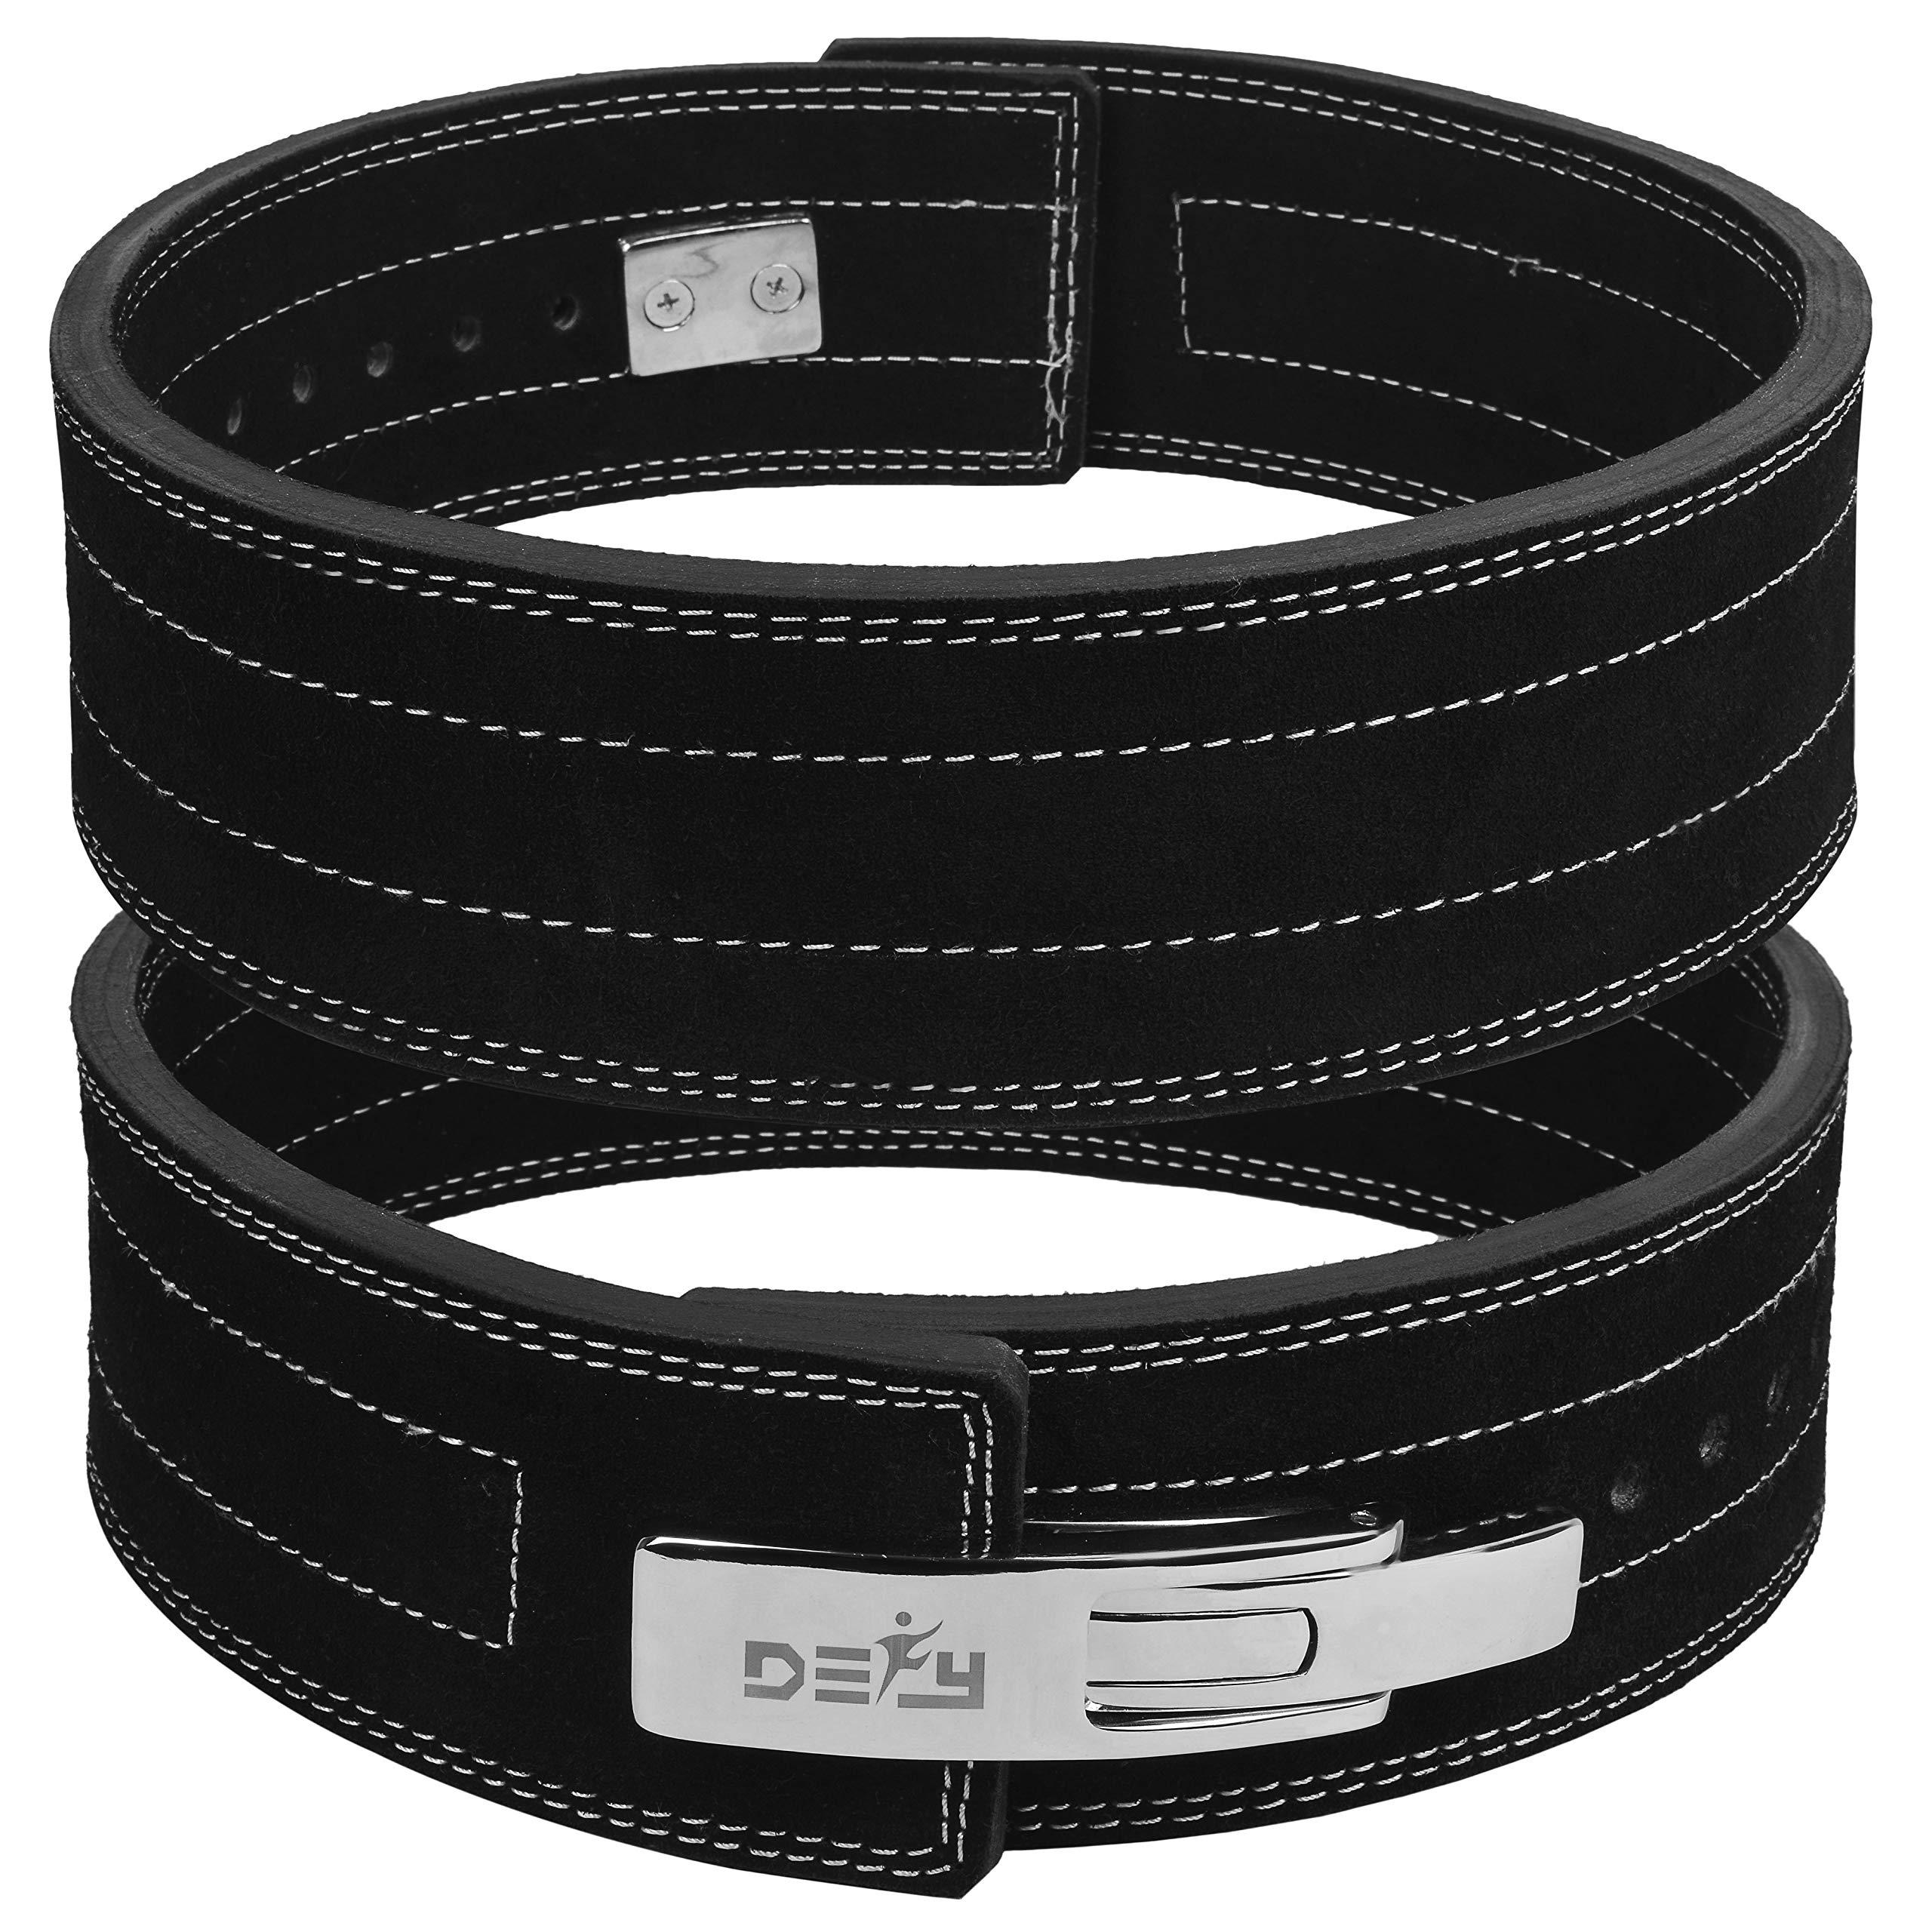 DEFY Power Lifting Belt Lever Buckle Genuine Leather 10MM Gym Training Exercise Belt Black (XS)